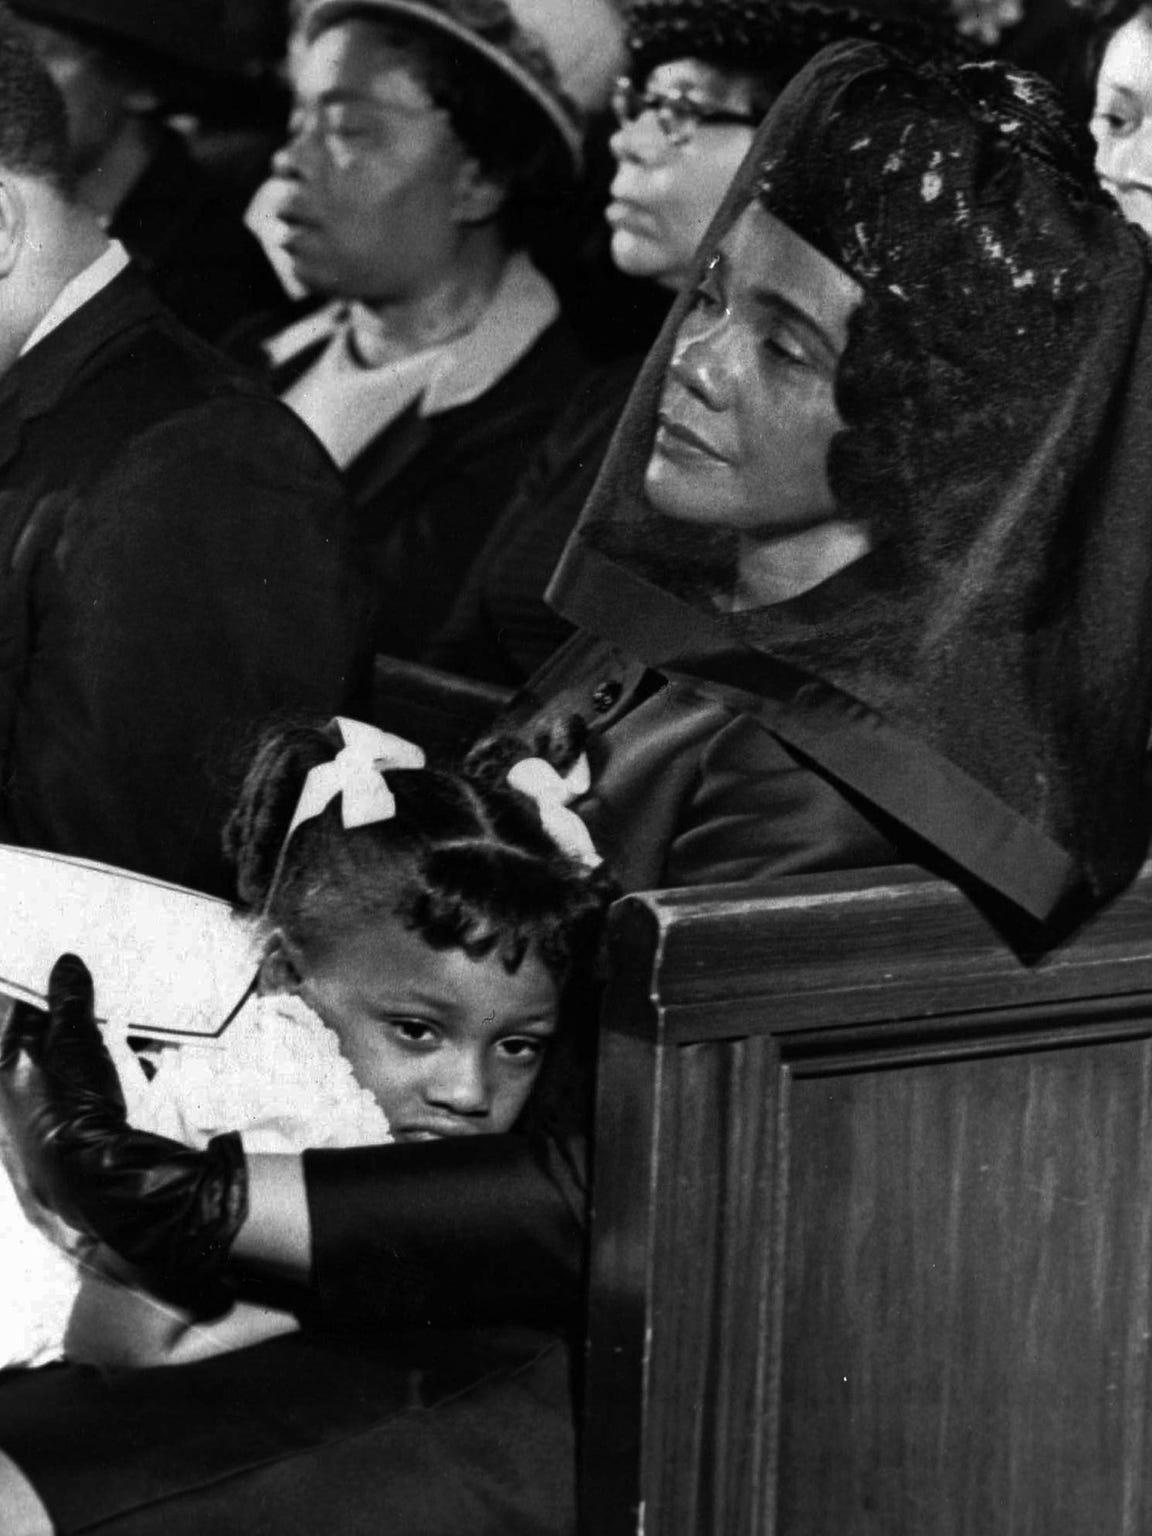 ** FILE ** Coretta Scott King and her daughter, Bernice